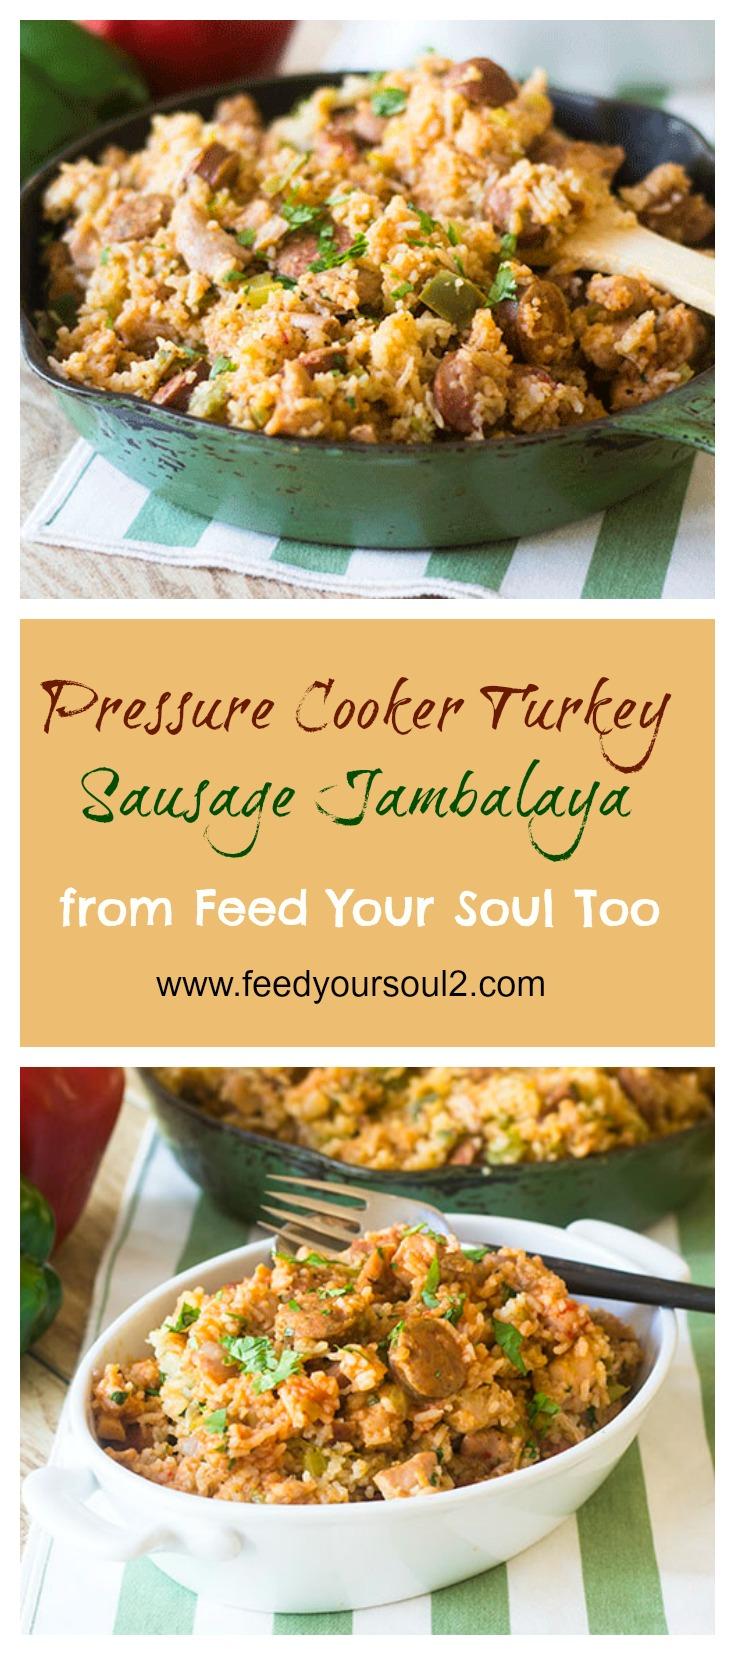 Pressure Cooker Chicken Sausage Jambalaya #Pressurecooker #Cajun #chicken #dinner   feedyoursoul2.com